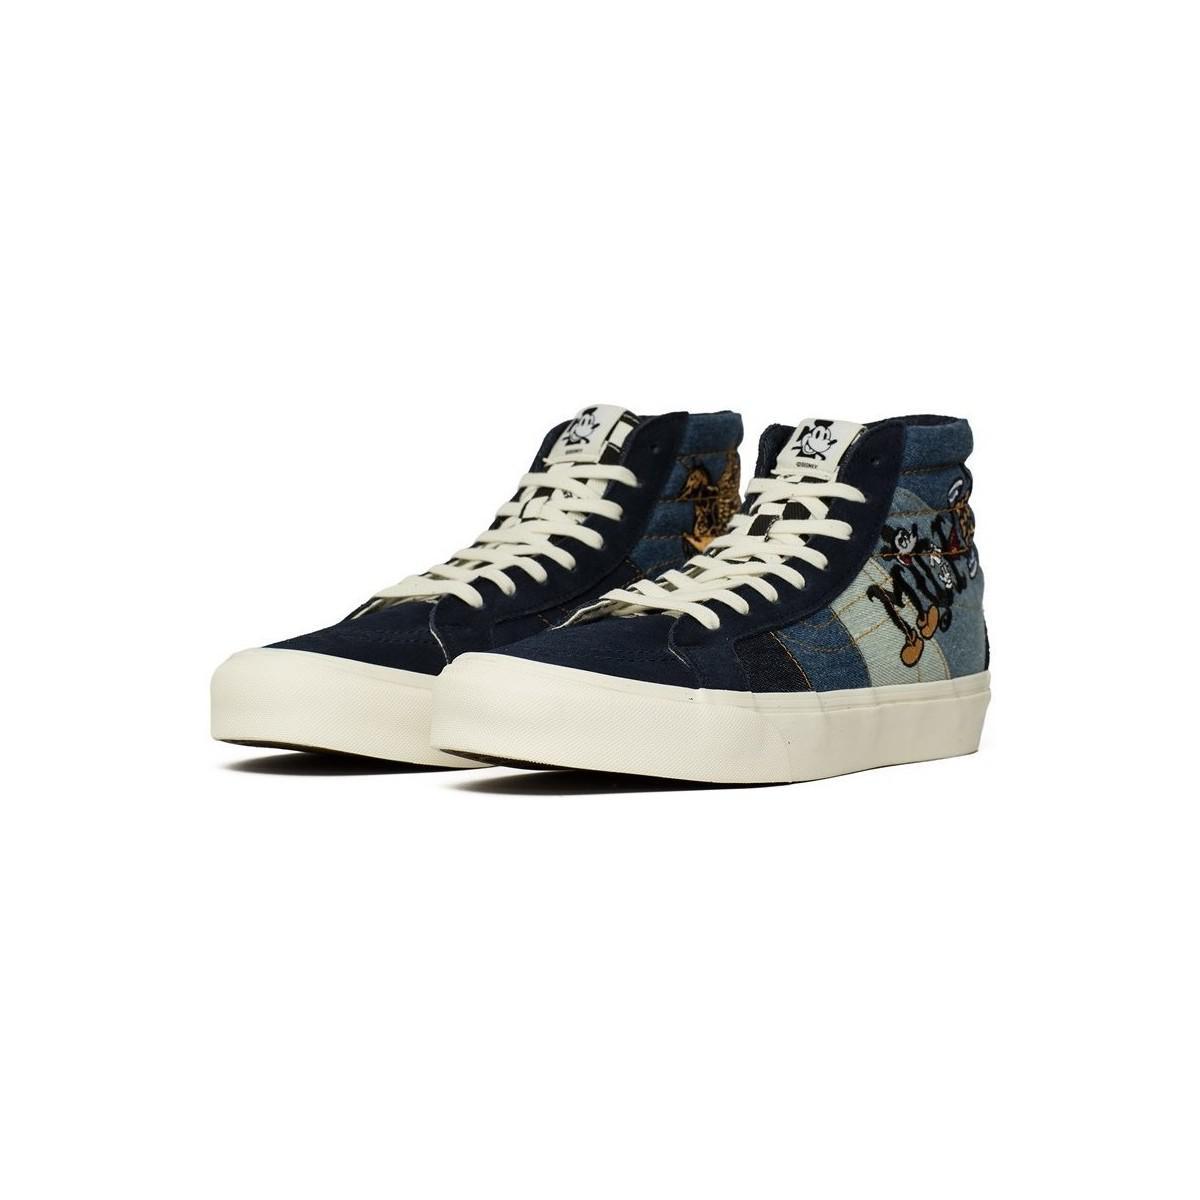 b10c2a1f46 Vans Vault Ua Og Sk8hi Le Lx X Mickey 90th Anniversary Men s Shoes ...